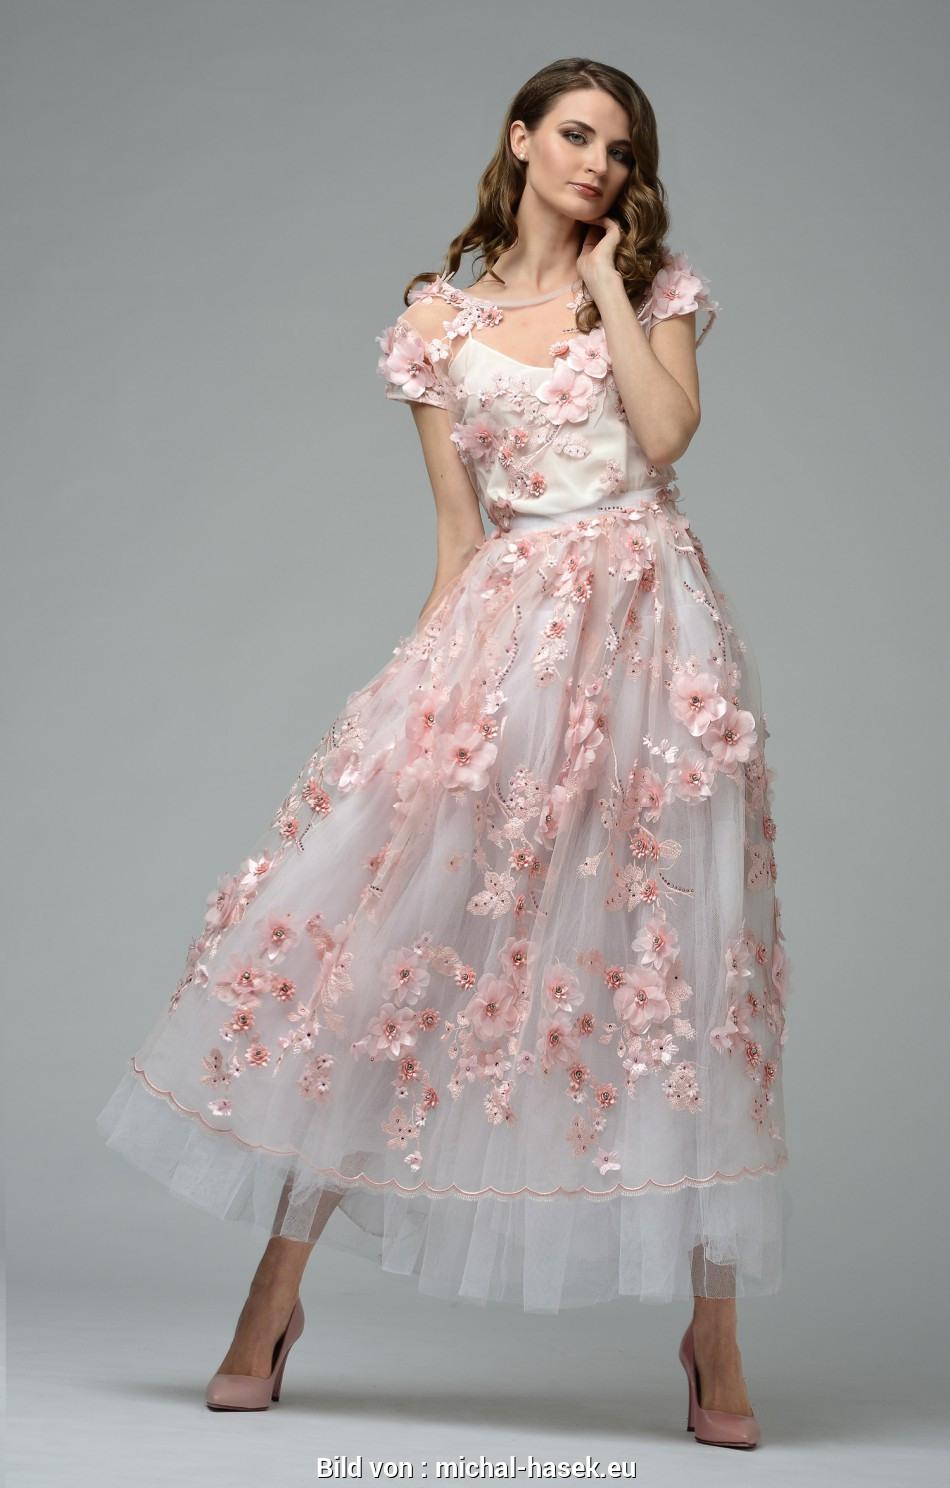 Formal Genial Designer Abend Kleid Vertrieb17 Einzigartig Designer Abend Kleid Boutique